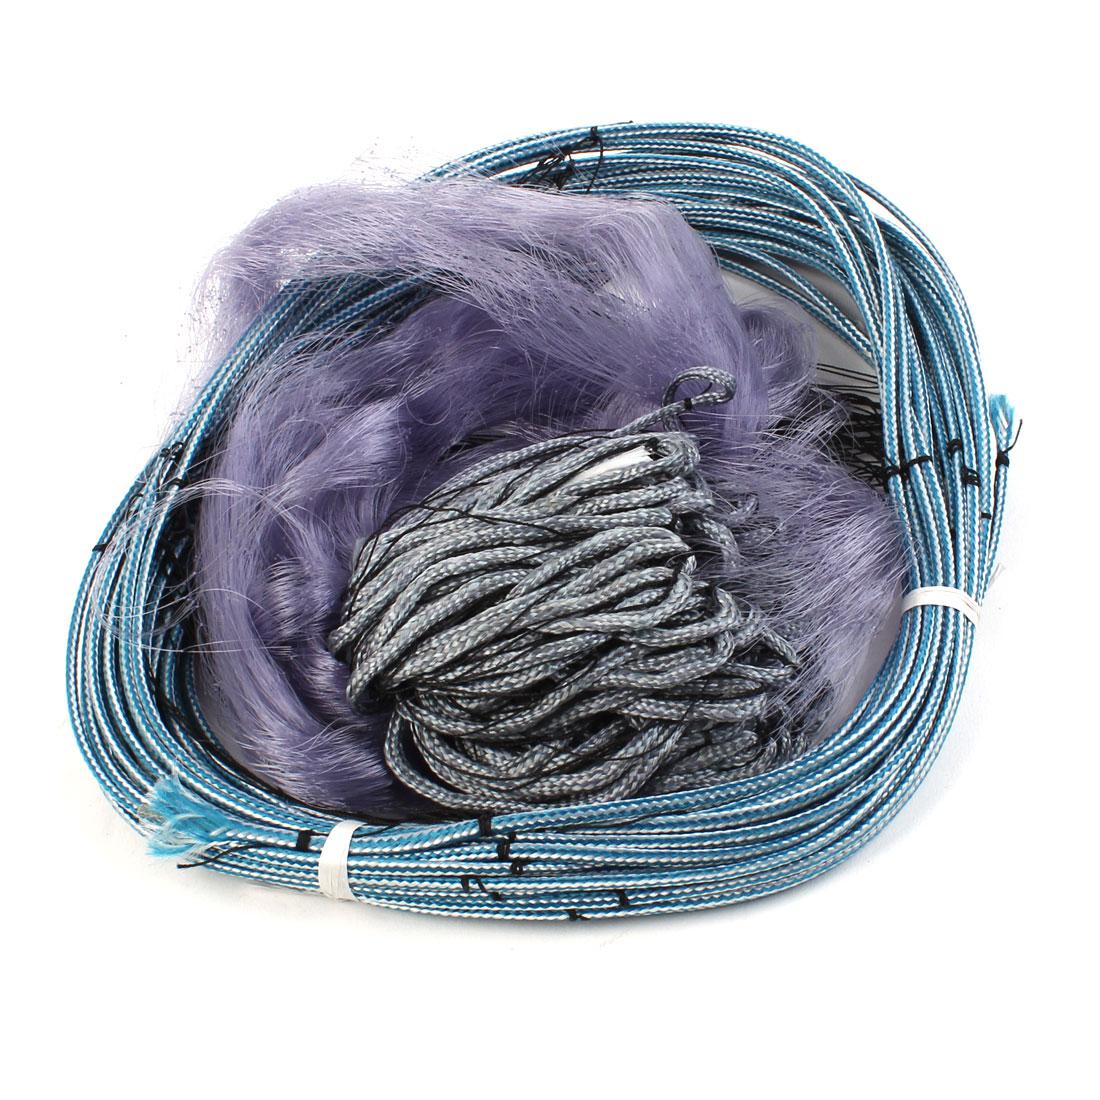 30M Length 1.8M Depth 4.5cm x 4.5cm Mesh Hole Fishing Tool Fish Gill Landing Net